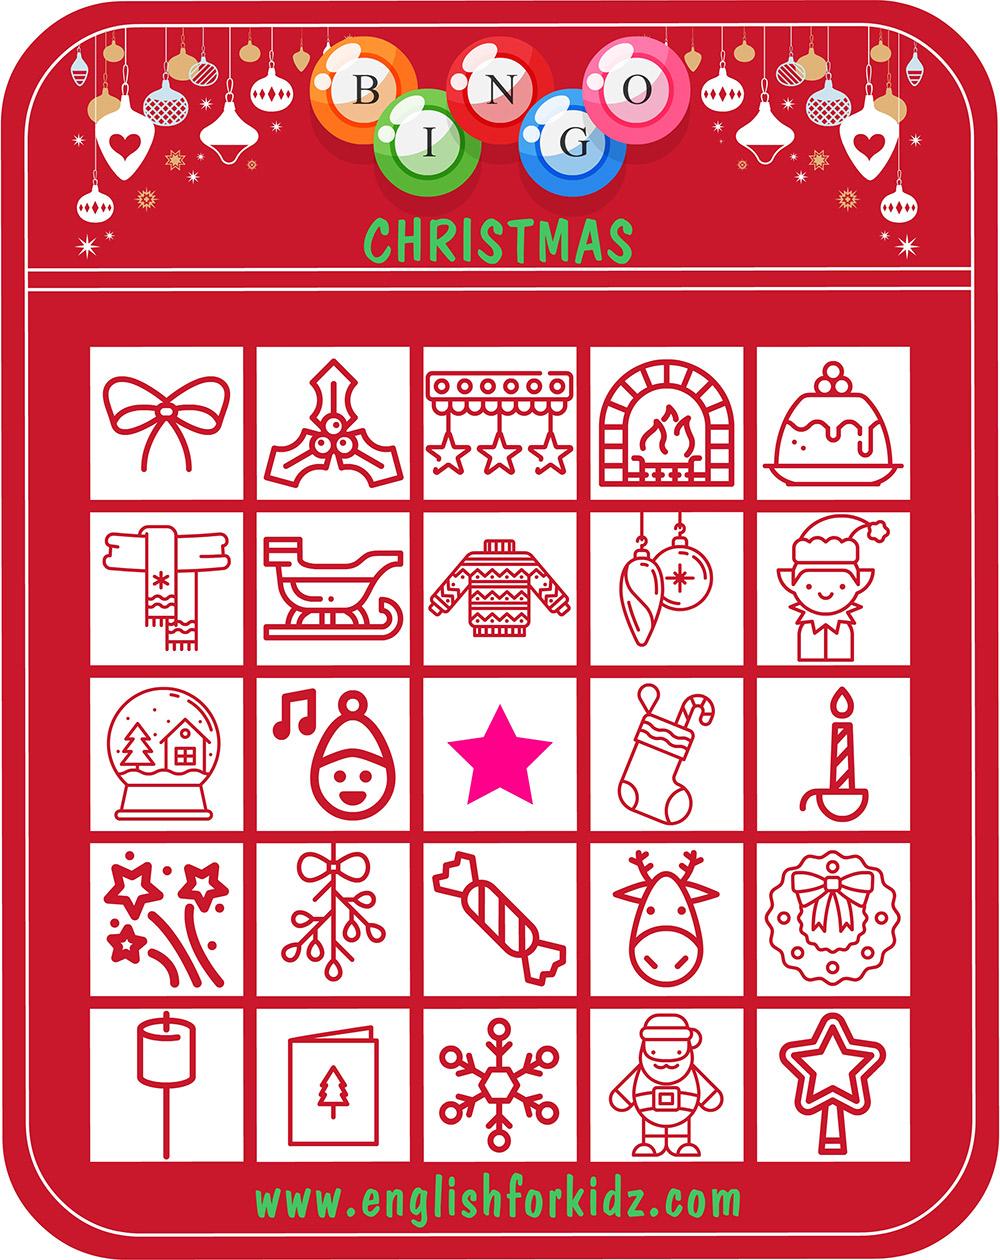 ESL Christmas Bingo Game